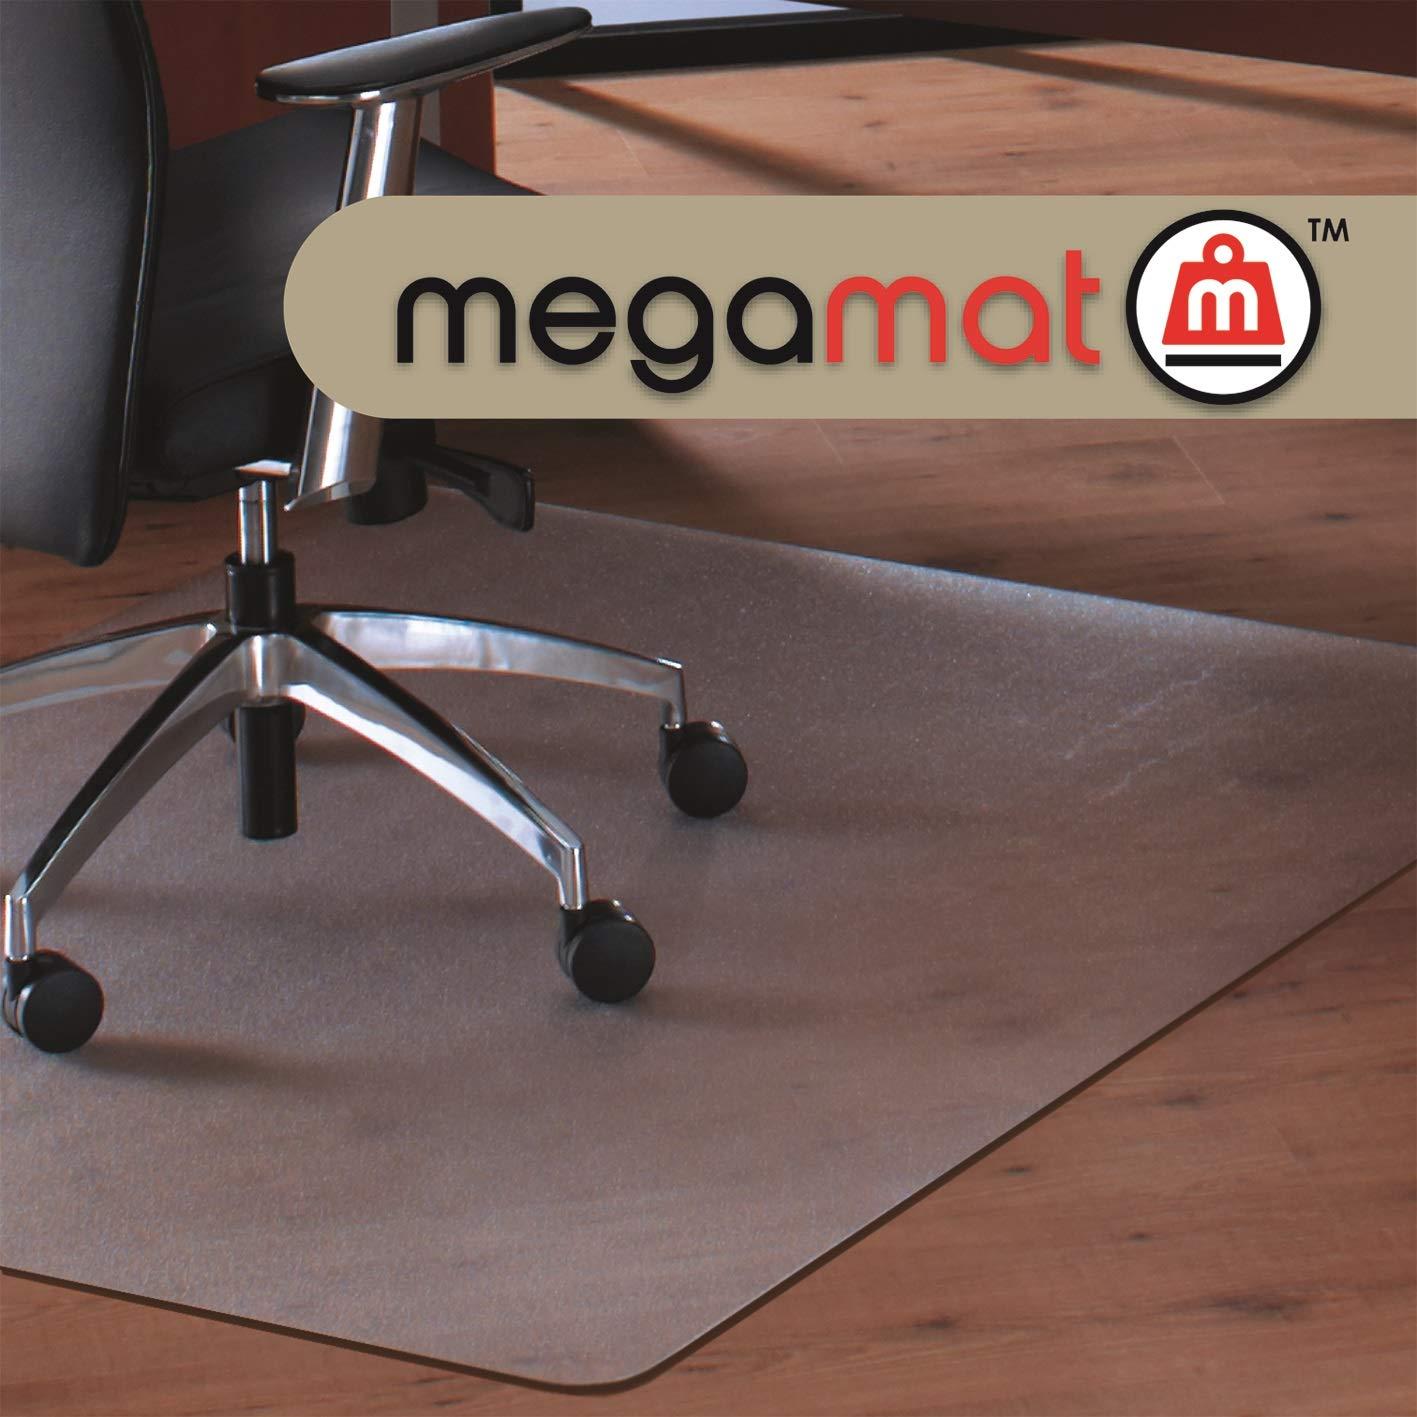 Cleartex MegaMat, Heavy Duty Chair Mat, for Hard Floors or Carpets, Size 46'' x 60'' (FCM121525ER)